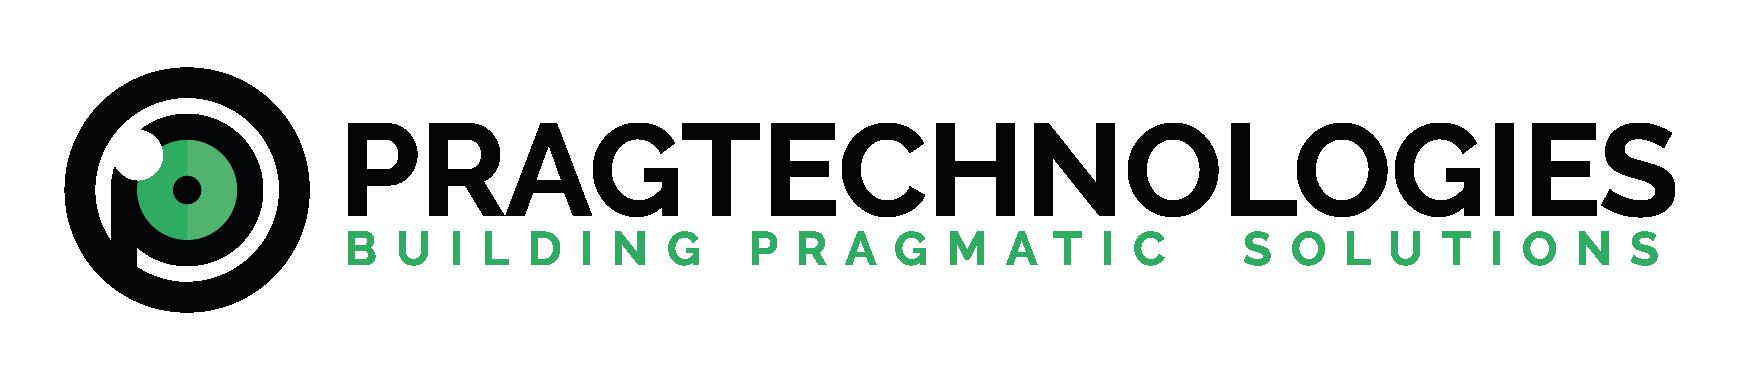 Pragtechnologies Logo